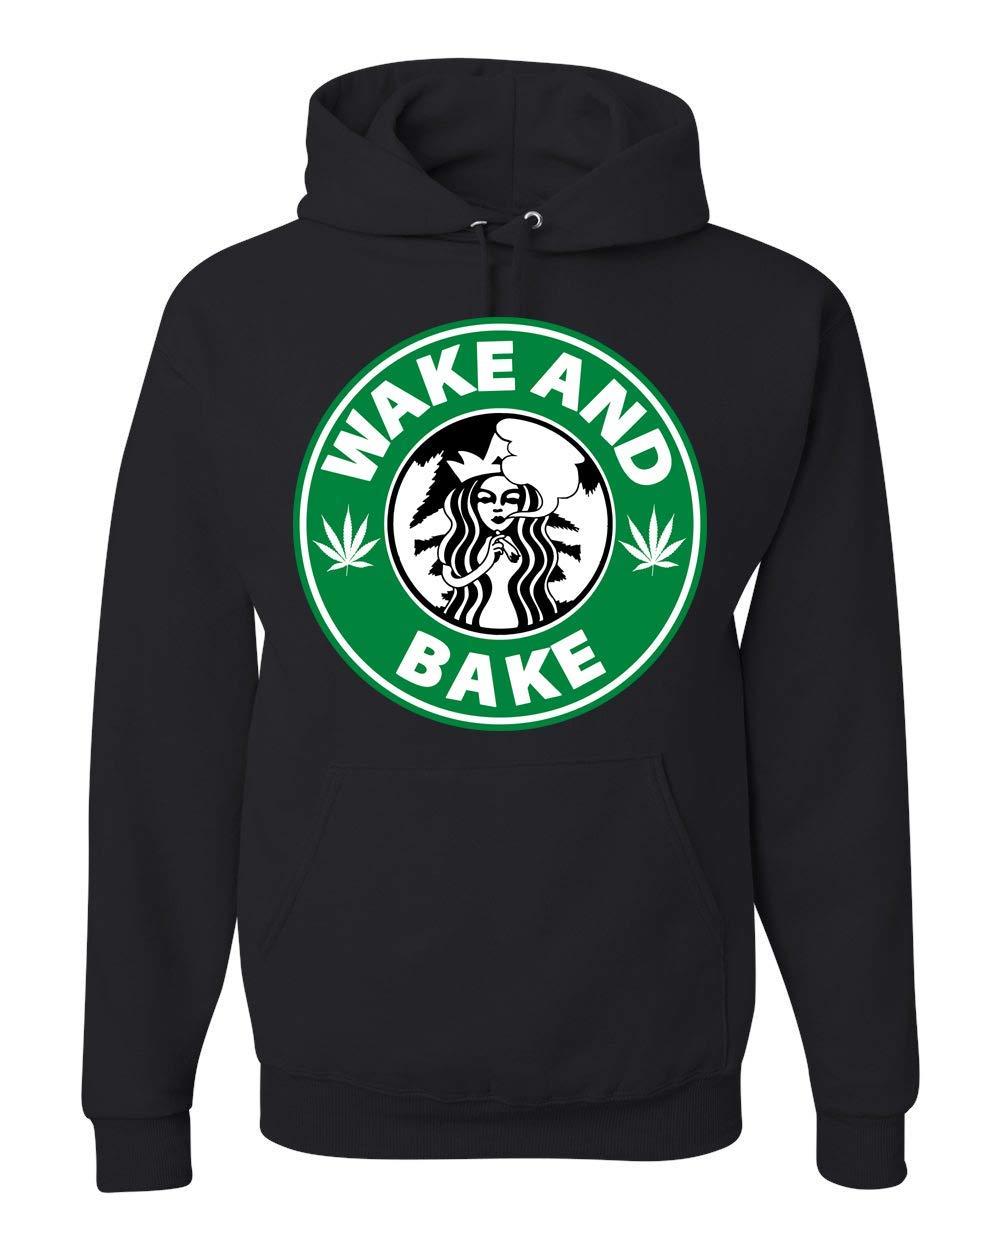 Memetic Adult Wake And Bake Hooded Shirts